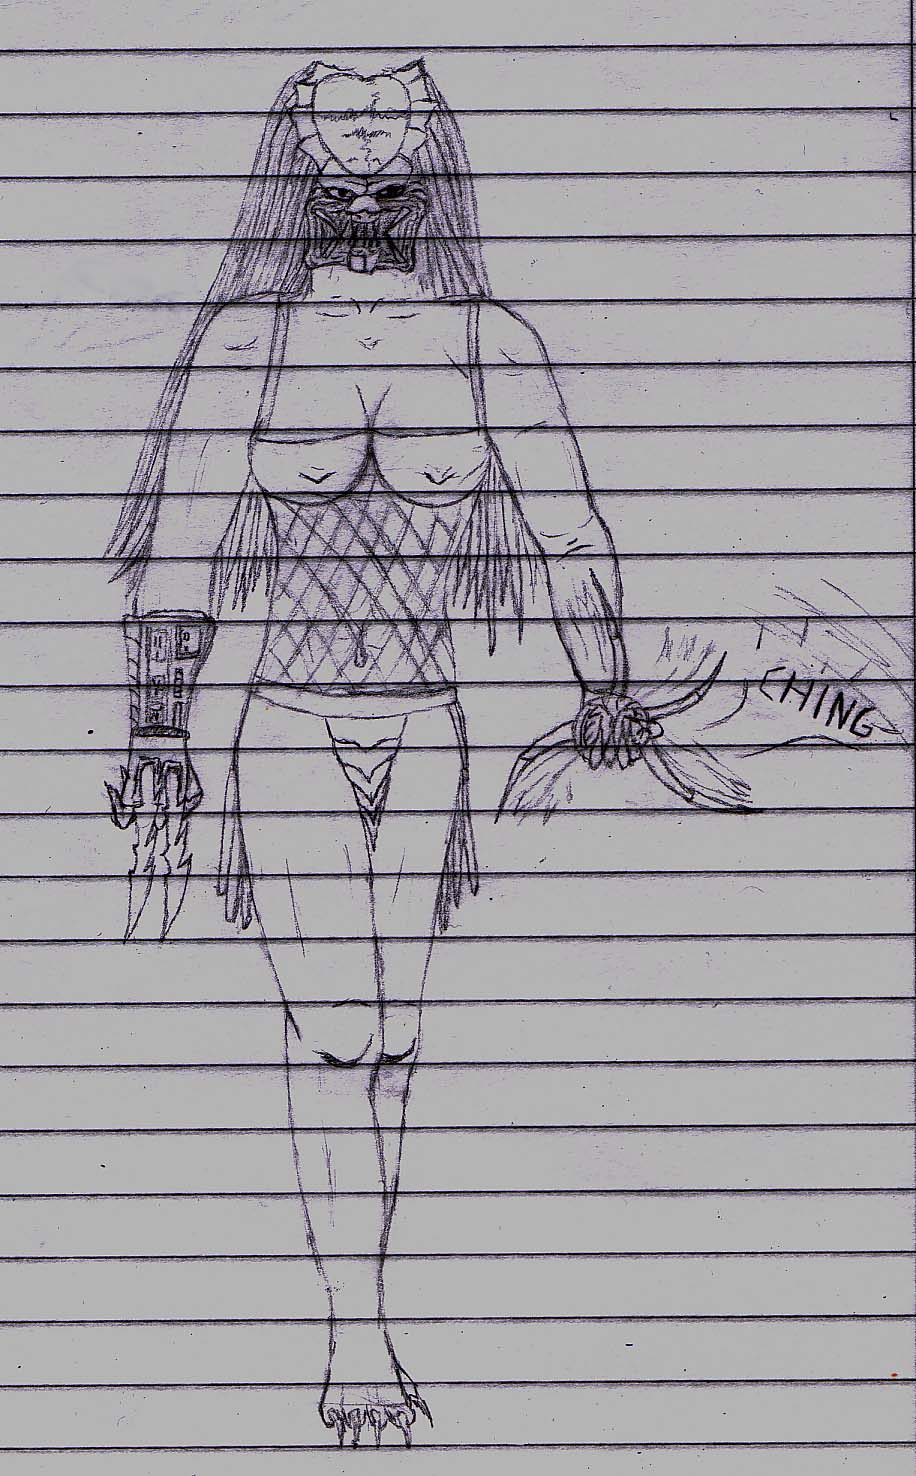 Drawn warrior yautja By on Snackrib Wolfy Wolfy